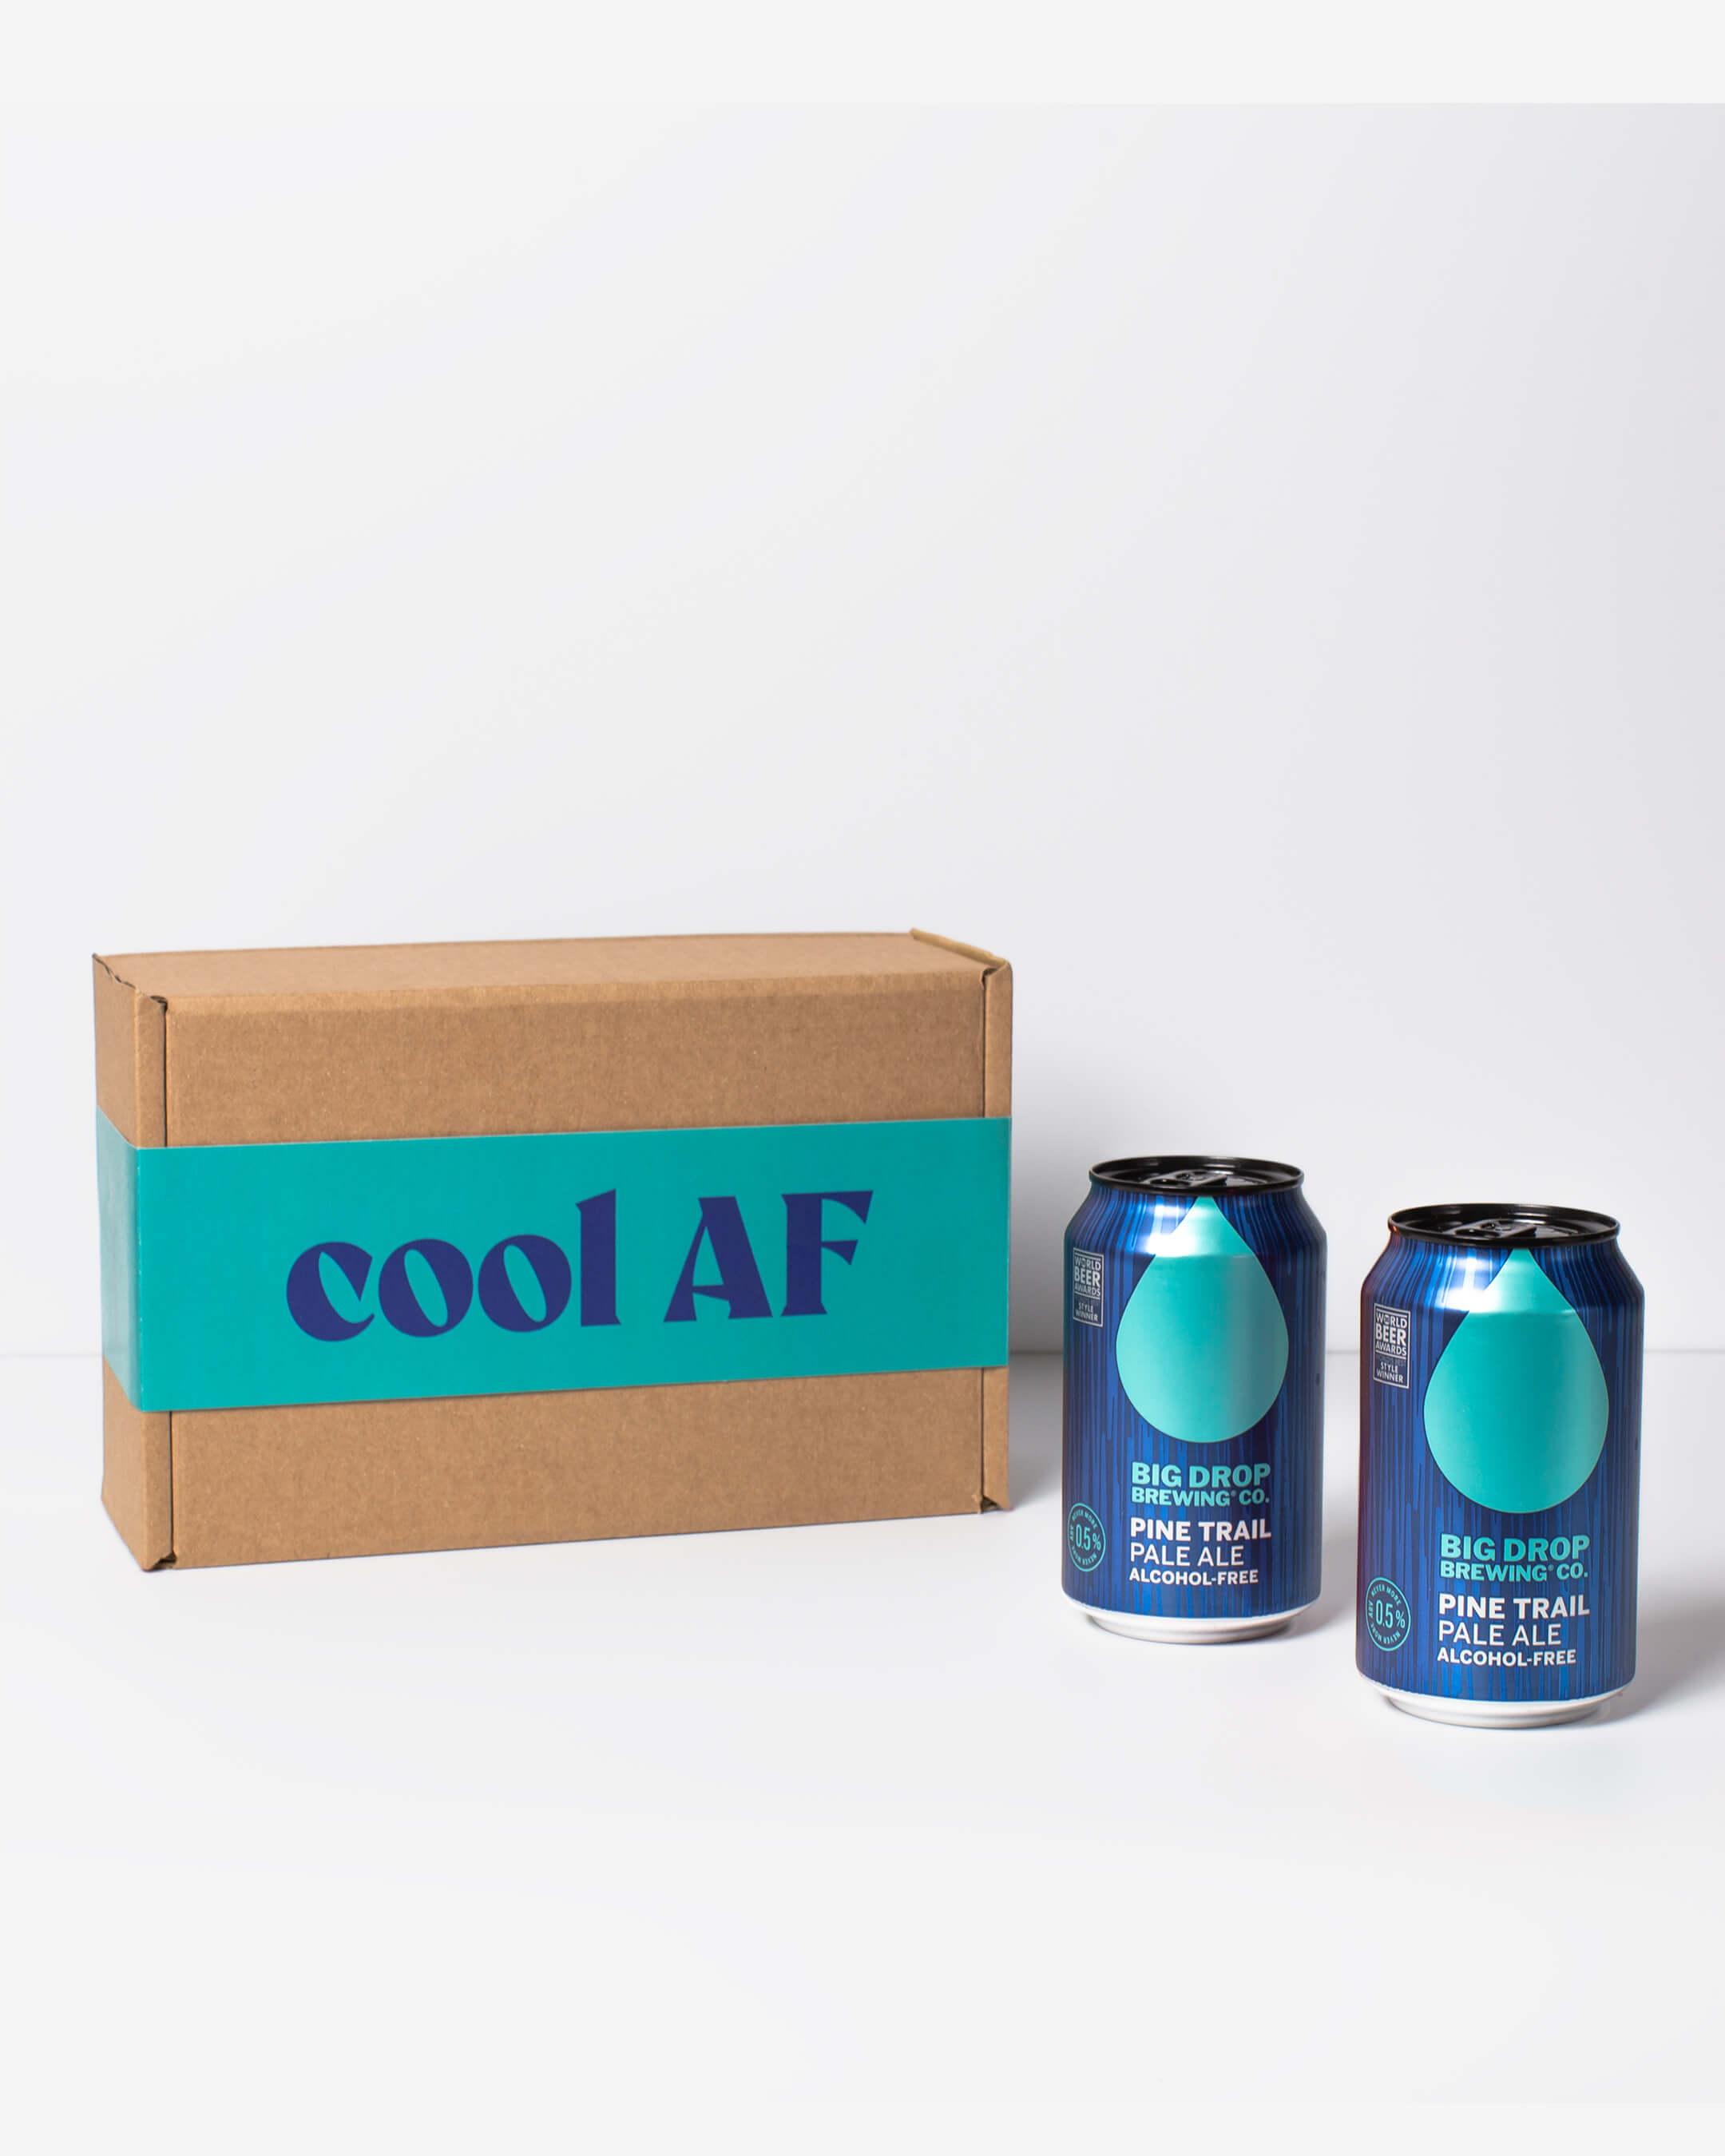 Big Drop alcohol free pale ale cans & ta. box